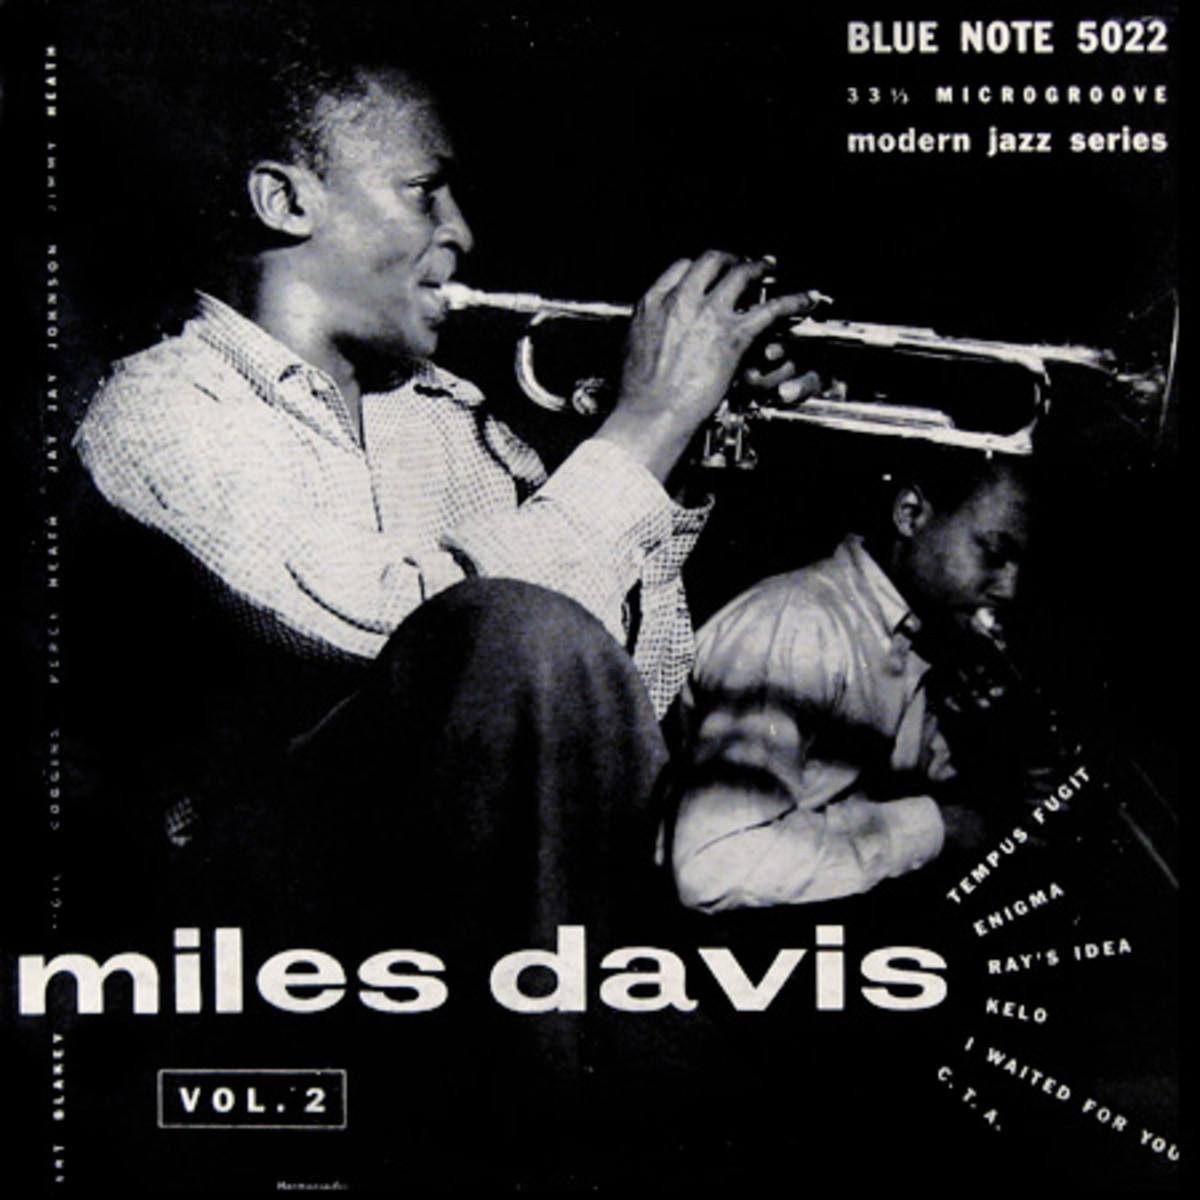 "Miles Davis, vol. 2 Blue Note Records BLP 5022 10"" LP Vinyl Microgroove LP Record (1953) Album Cover Design by John Hermansader, Photo by Francis Wolff"